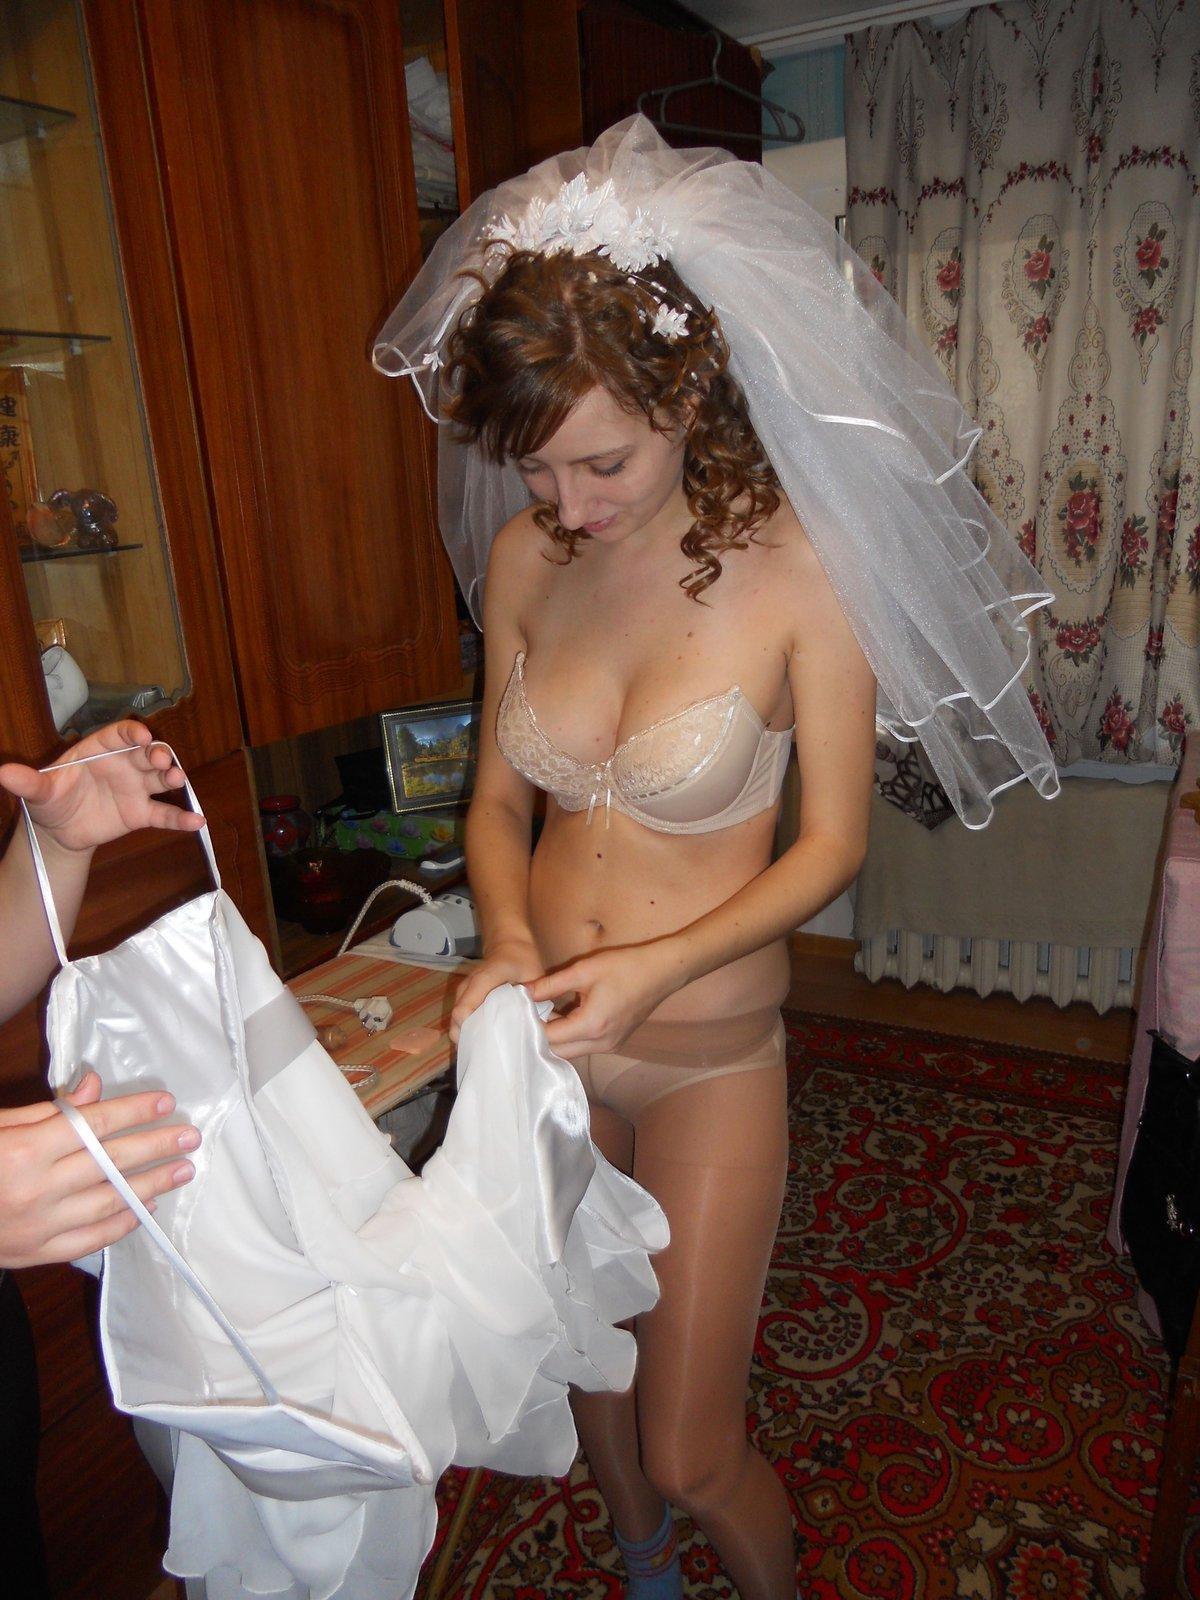 realno-sluchaynaya-semkaseksa-na-svadbe